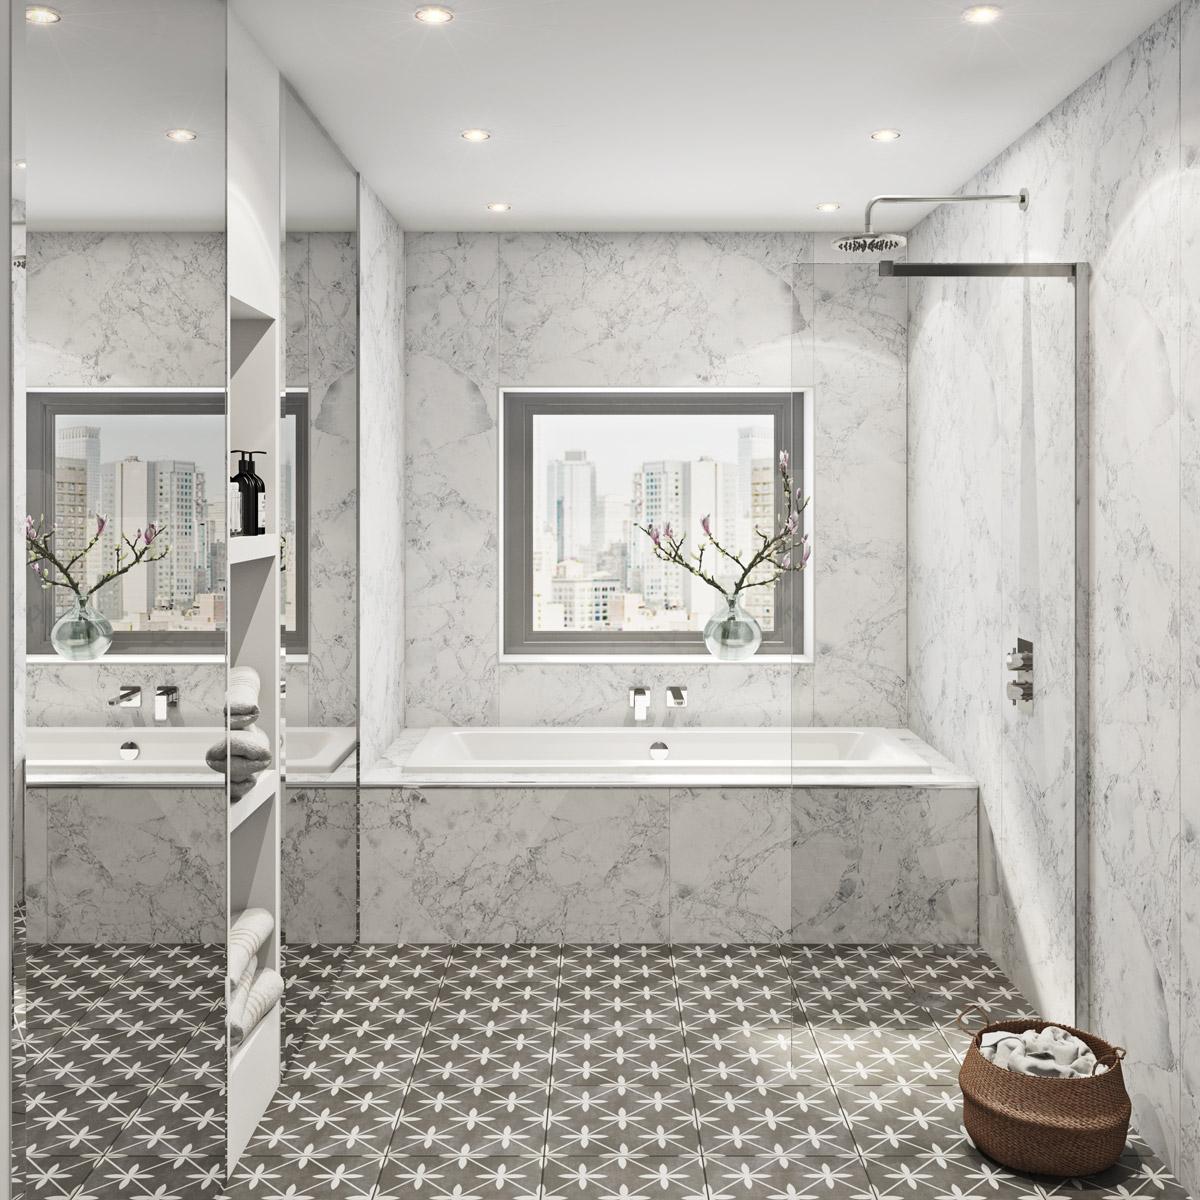 Multipanel Linda Barker shower wall panels | VictoriaPlum.com